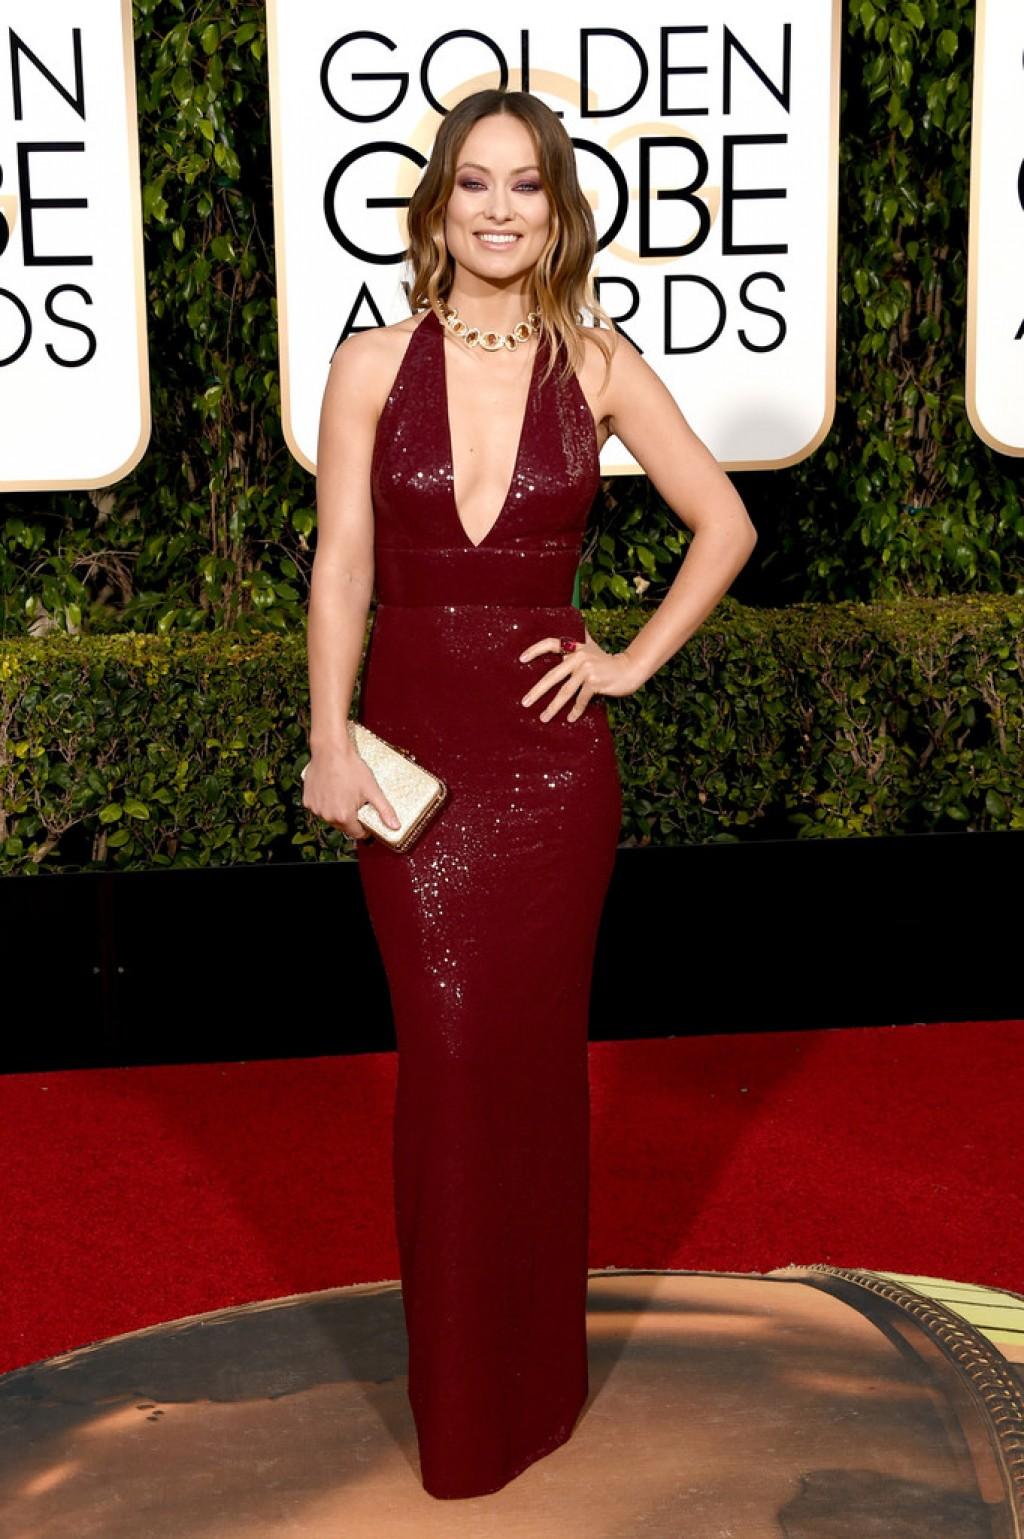 Olivia-Wilde-2016-Golden-Globes--1024x1539